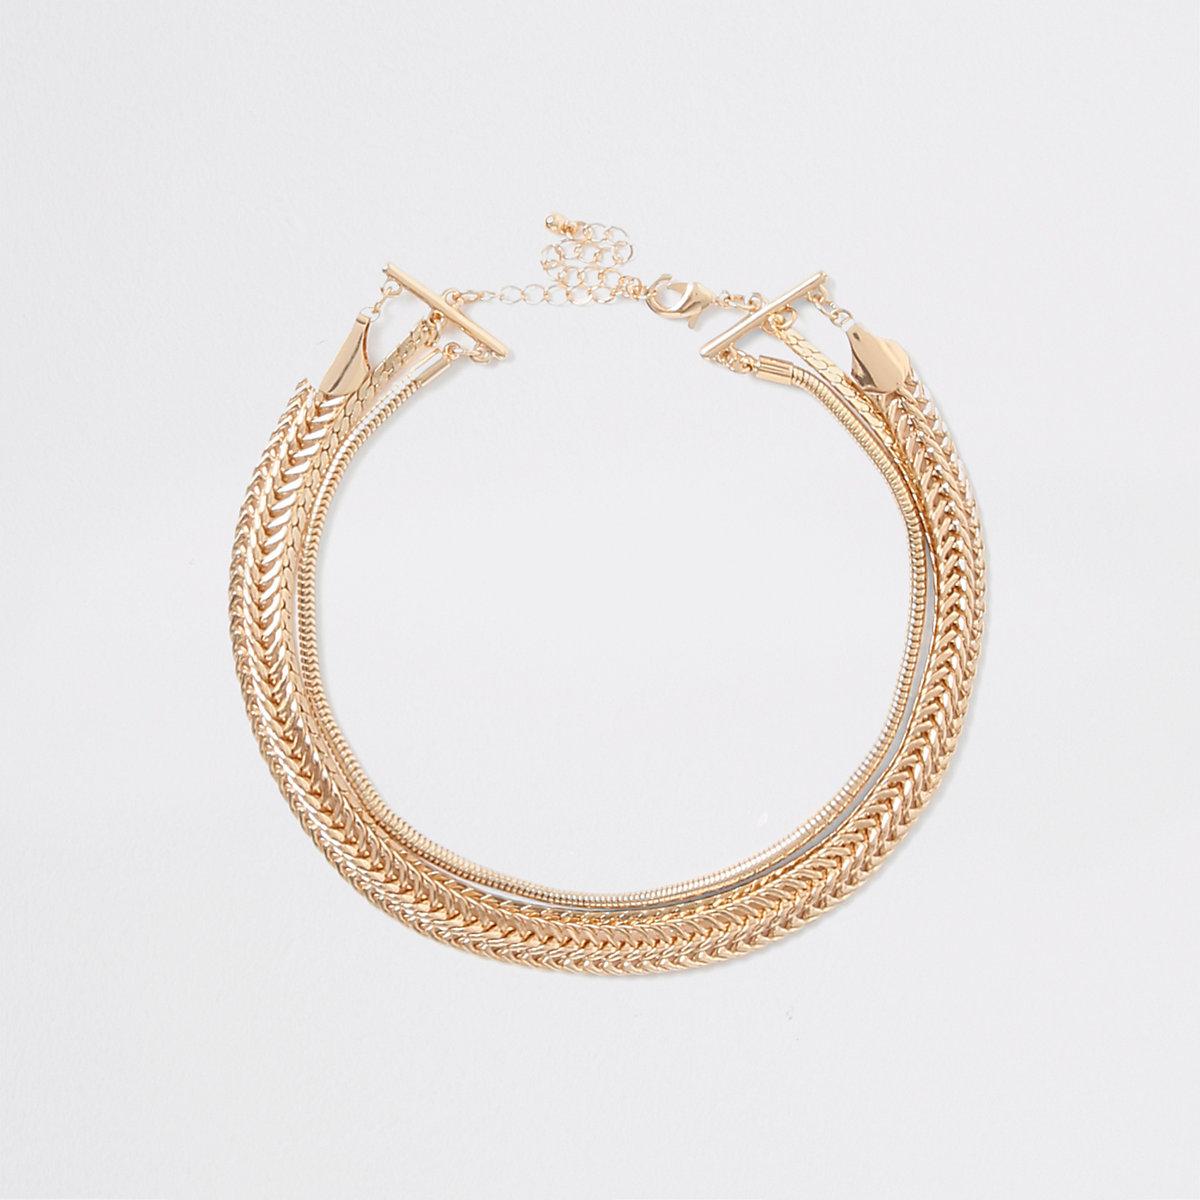 Gold tone layered chain choker